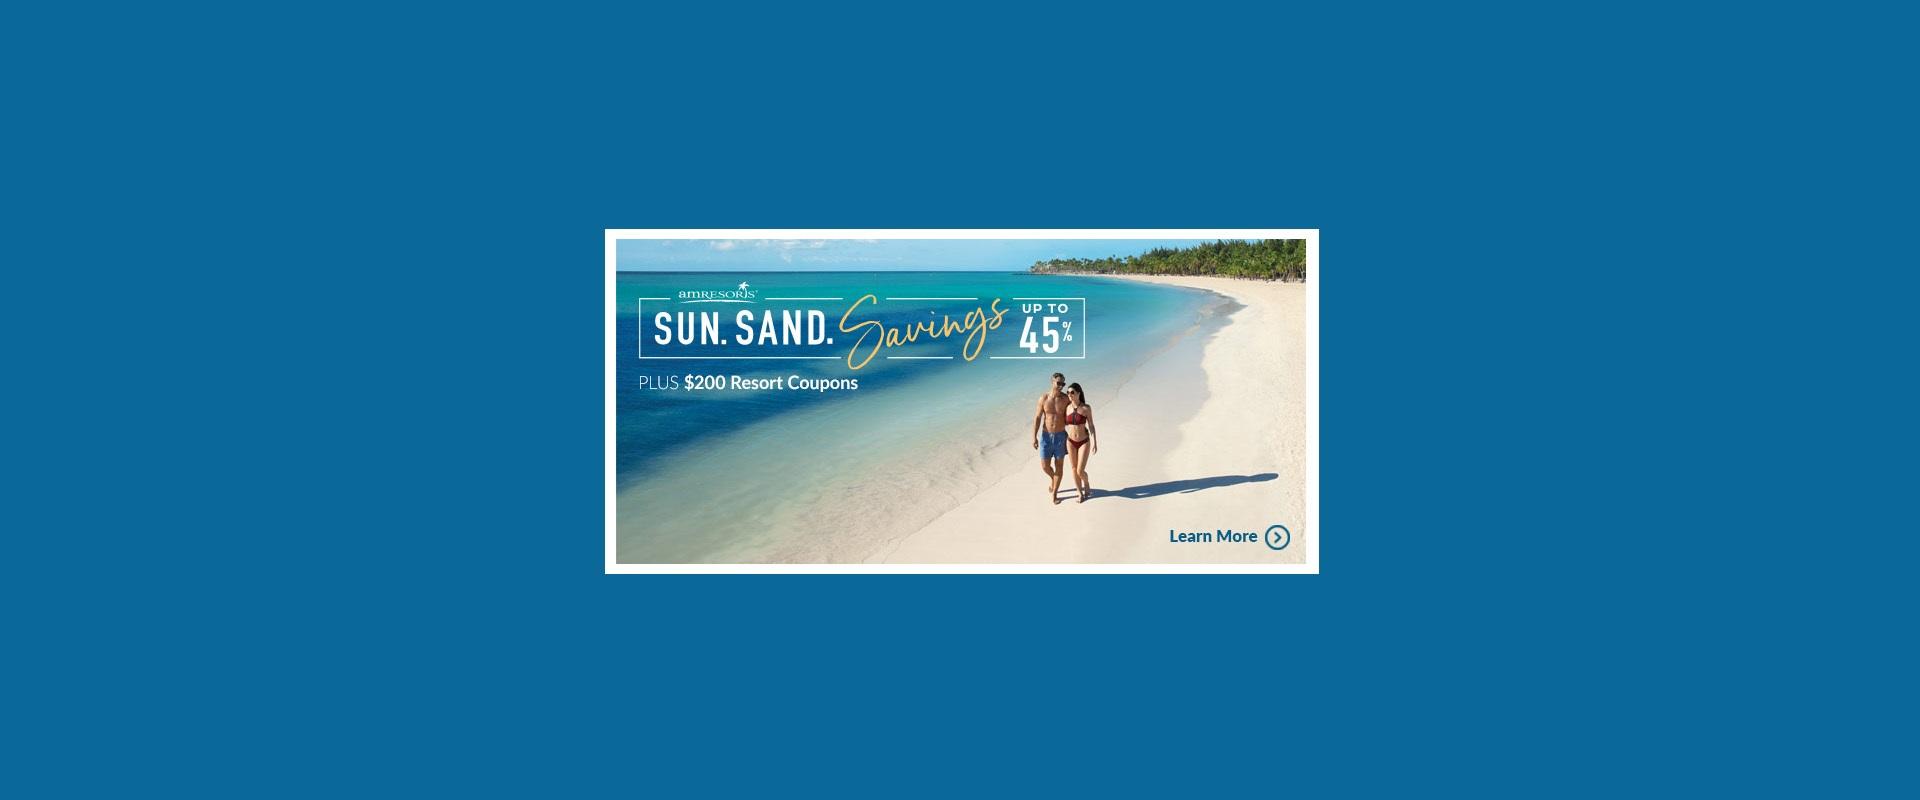 AMResorts-Sun-Sand-Savings-Banner